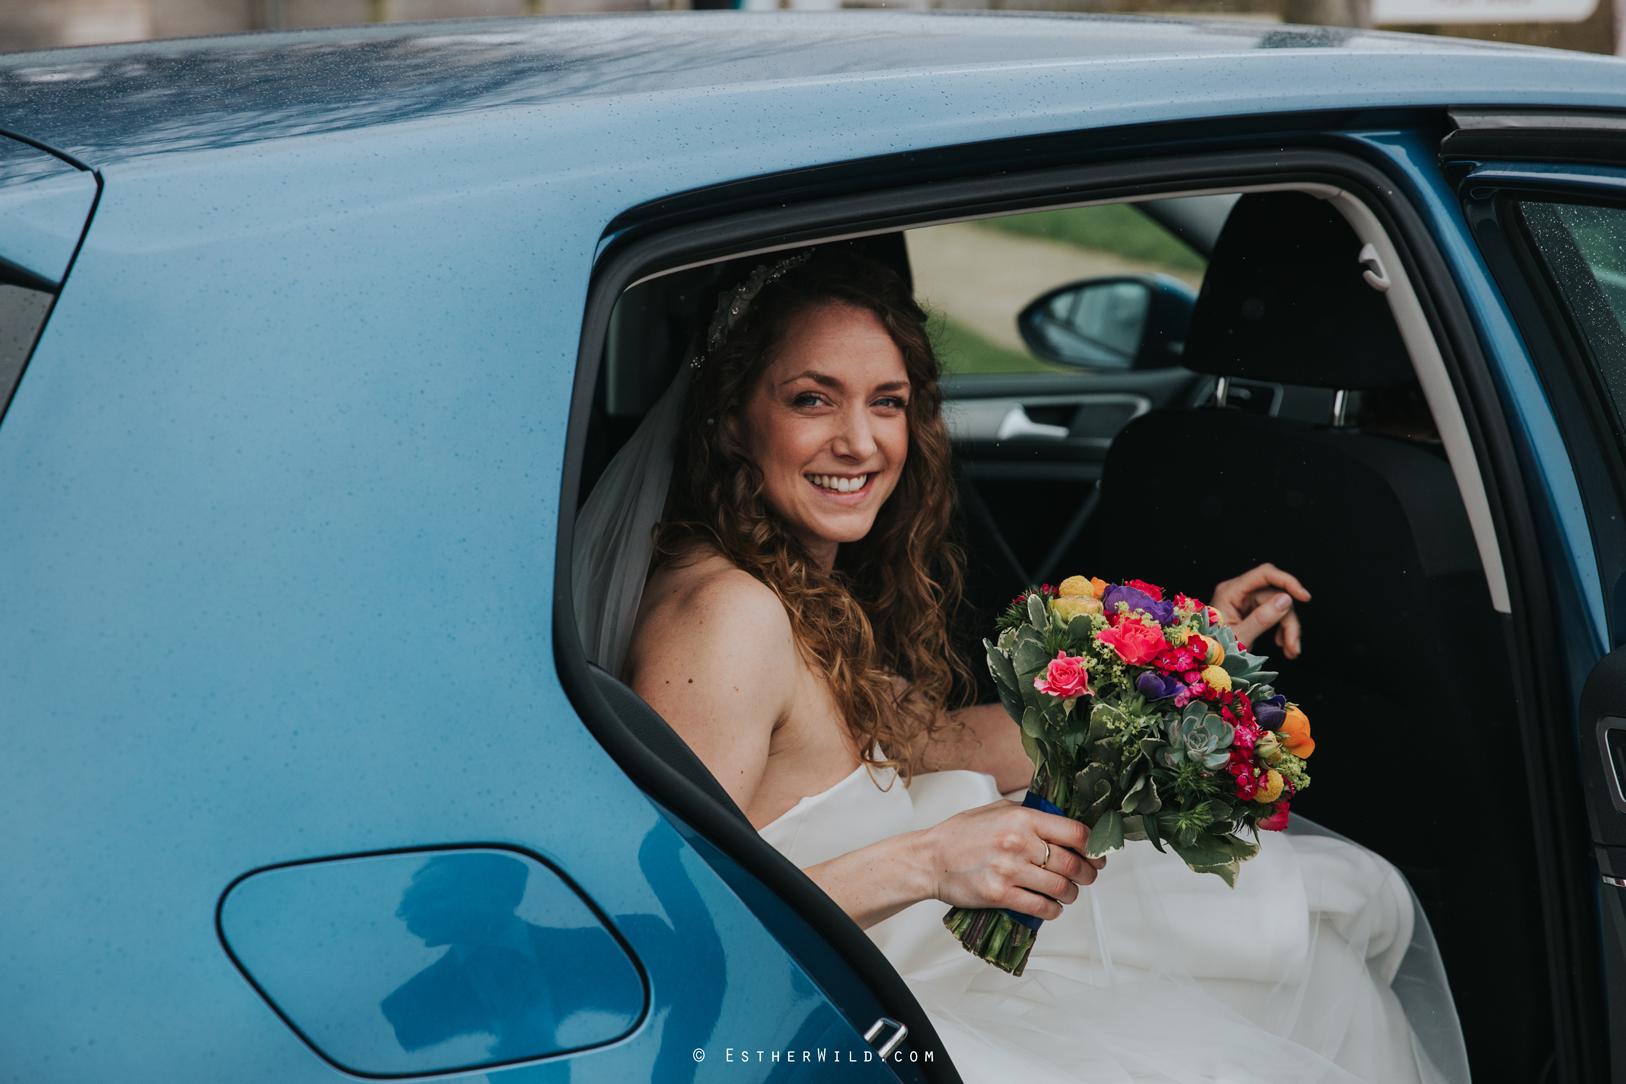 The_BoatHouse_Wedding_Venue_Ormesby_Norfolk_Broads_Boat_Wedding_Photography_Esther_Wild_Photographer_IMG_0716.jpg